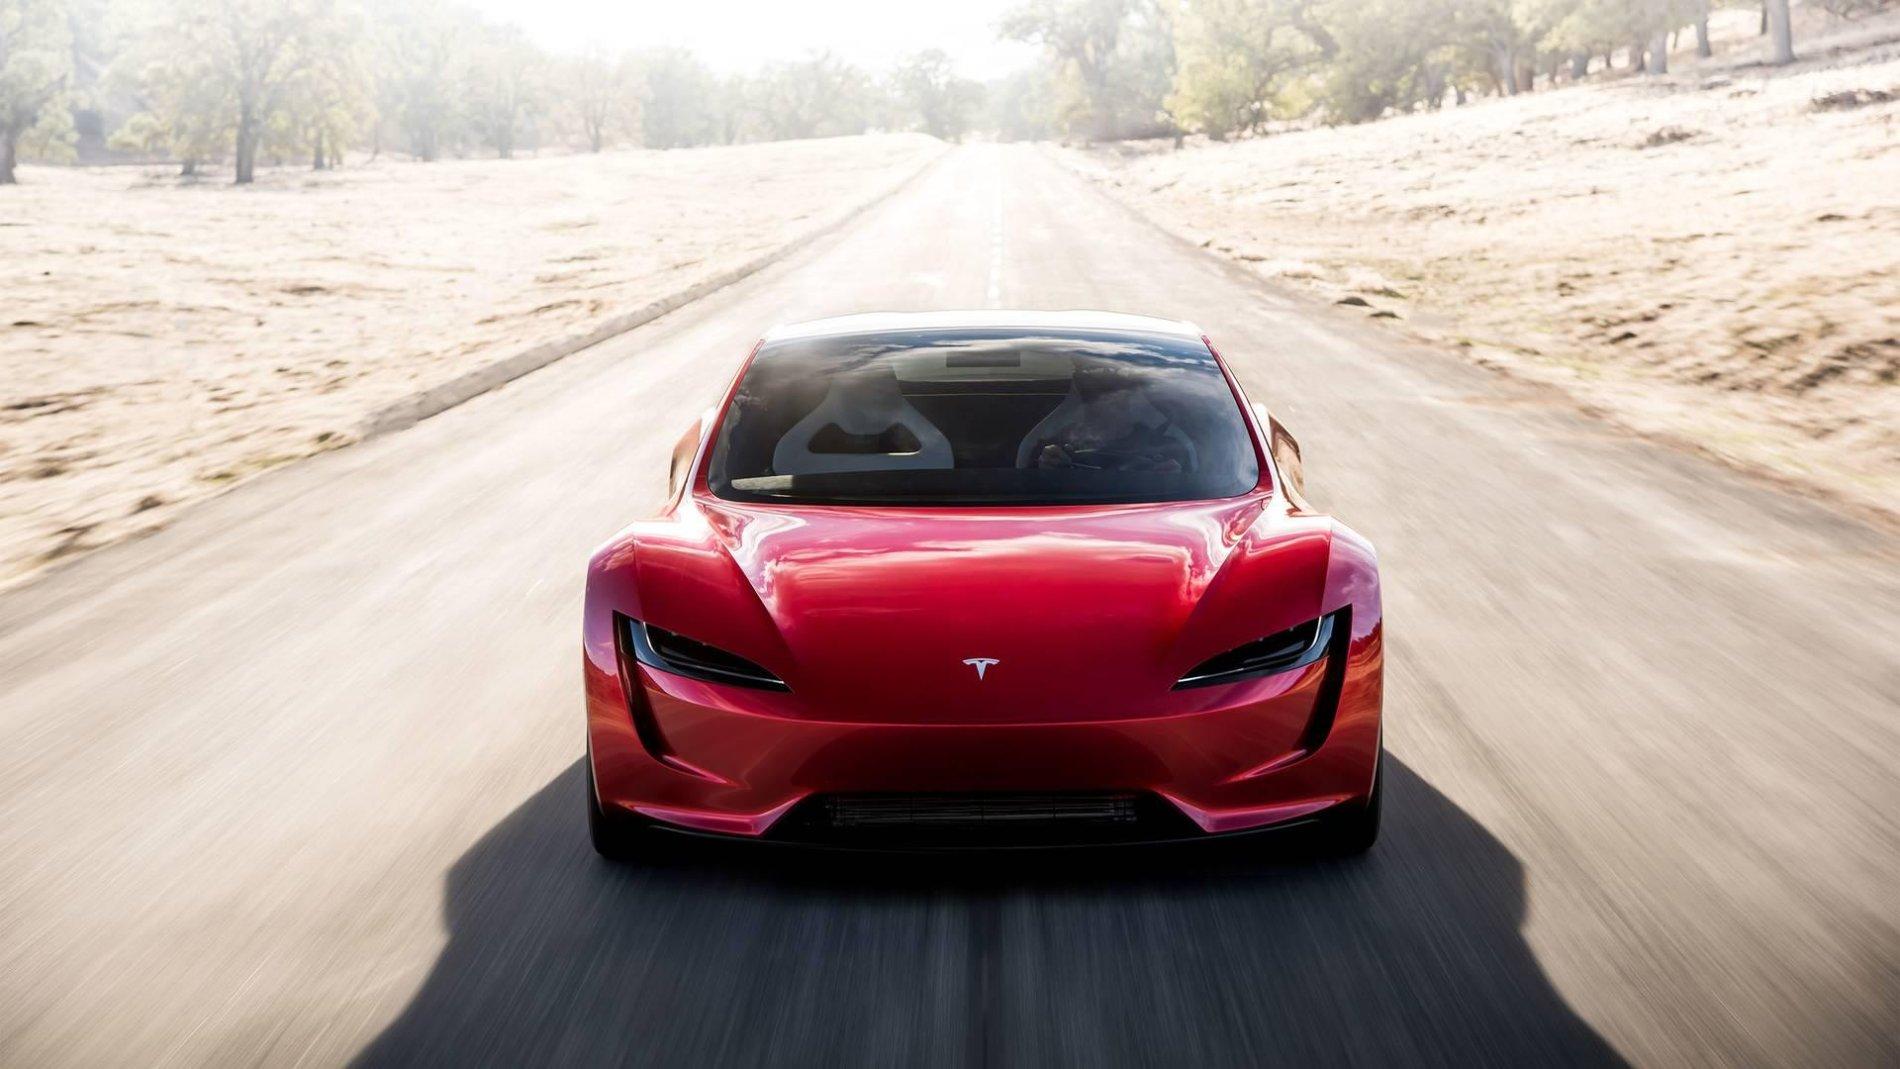 Tesla Roadster 2020 - Tesla Roadster 2020